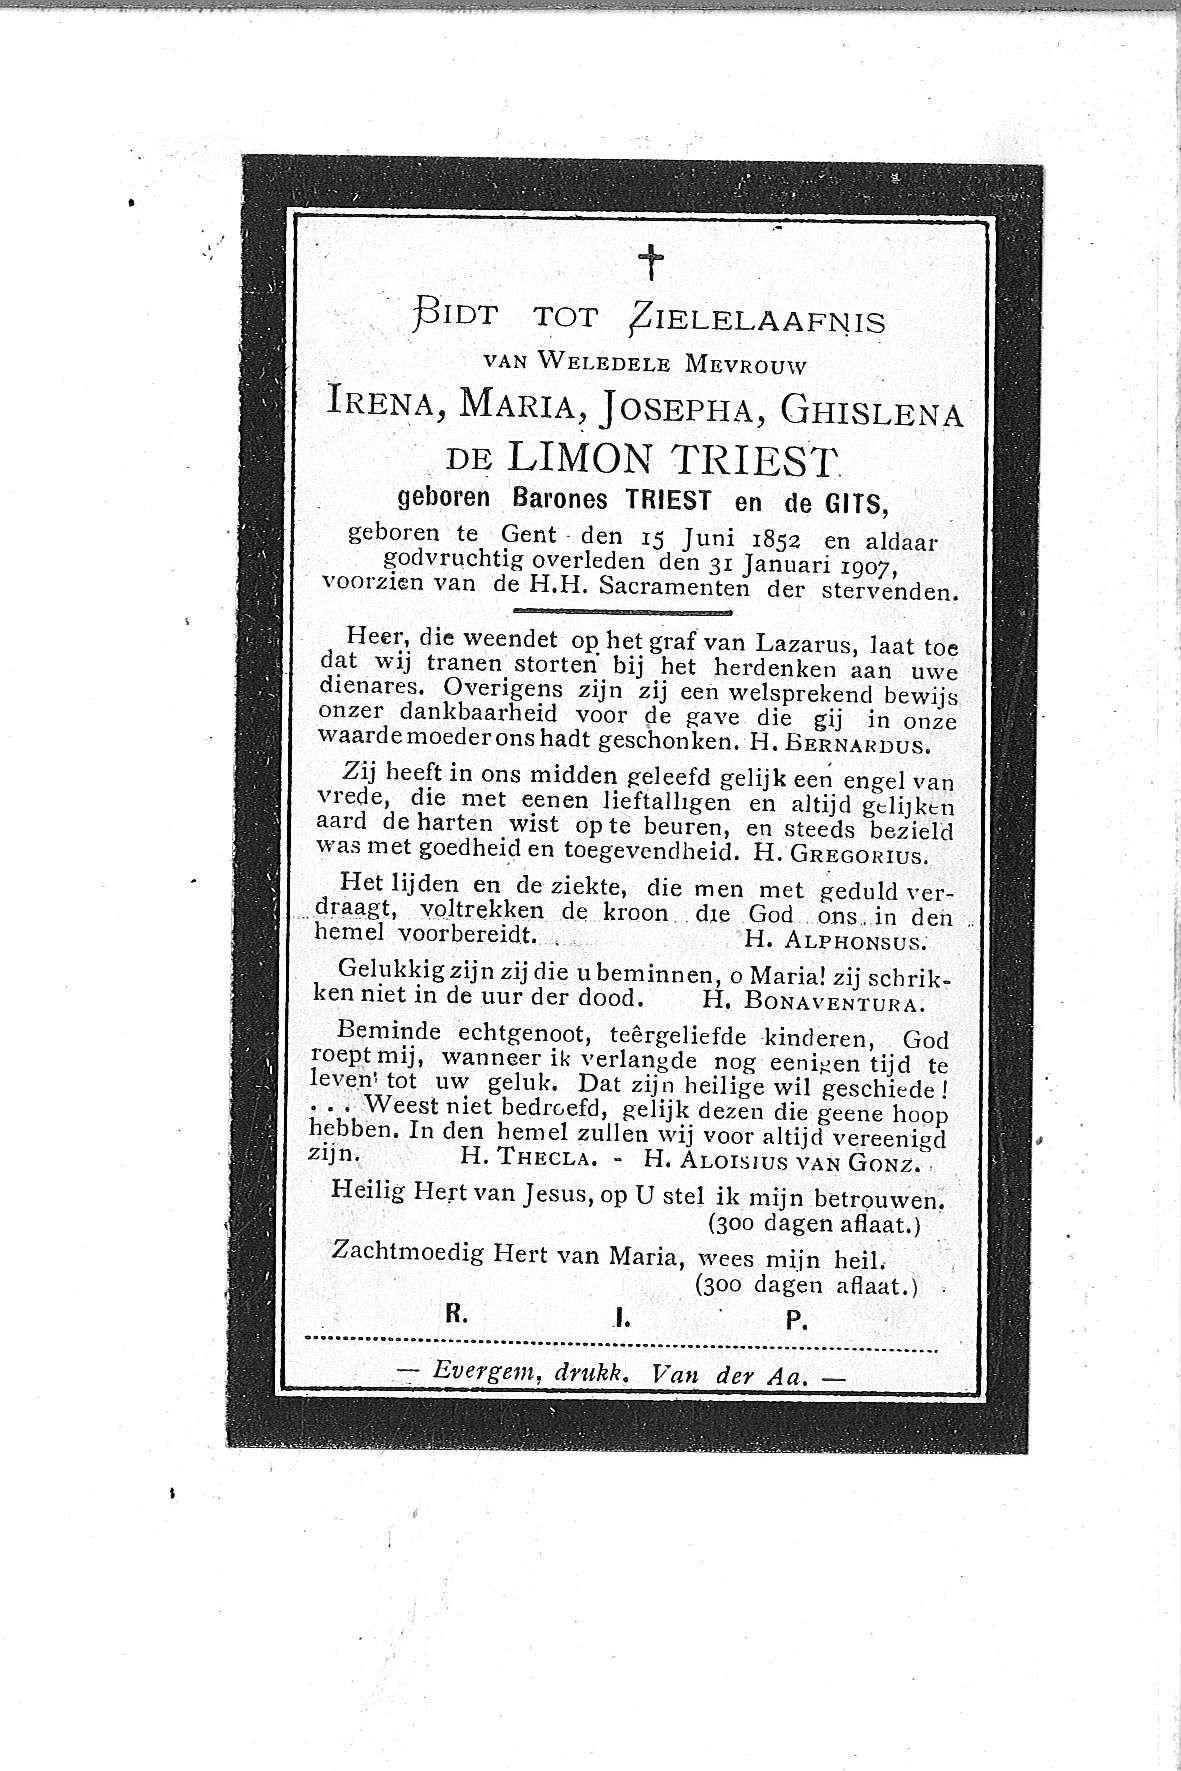 Irena-Maria-Josepha-Ghislena-(1907)-20120911093739_00292.jpg